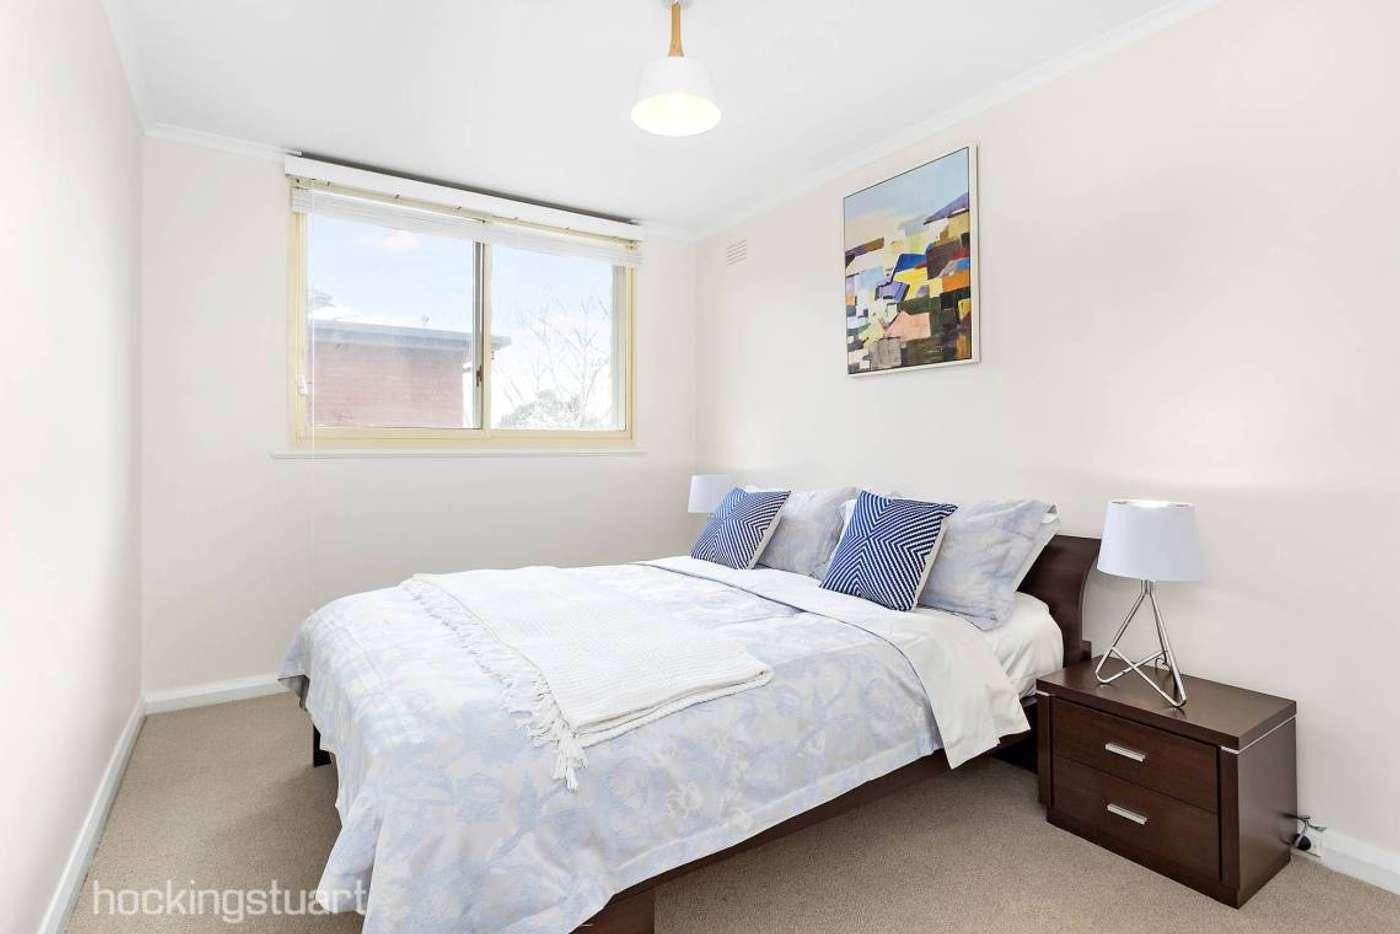 Sixth view of Homely apartment listing, 9/1512 Malvern Road, Glen Iris VIC 3146